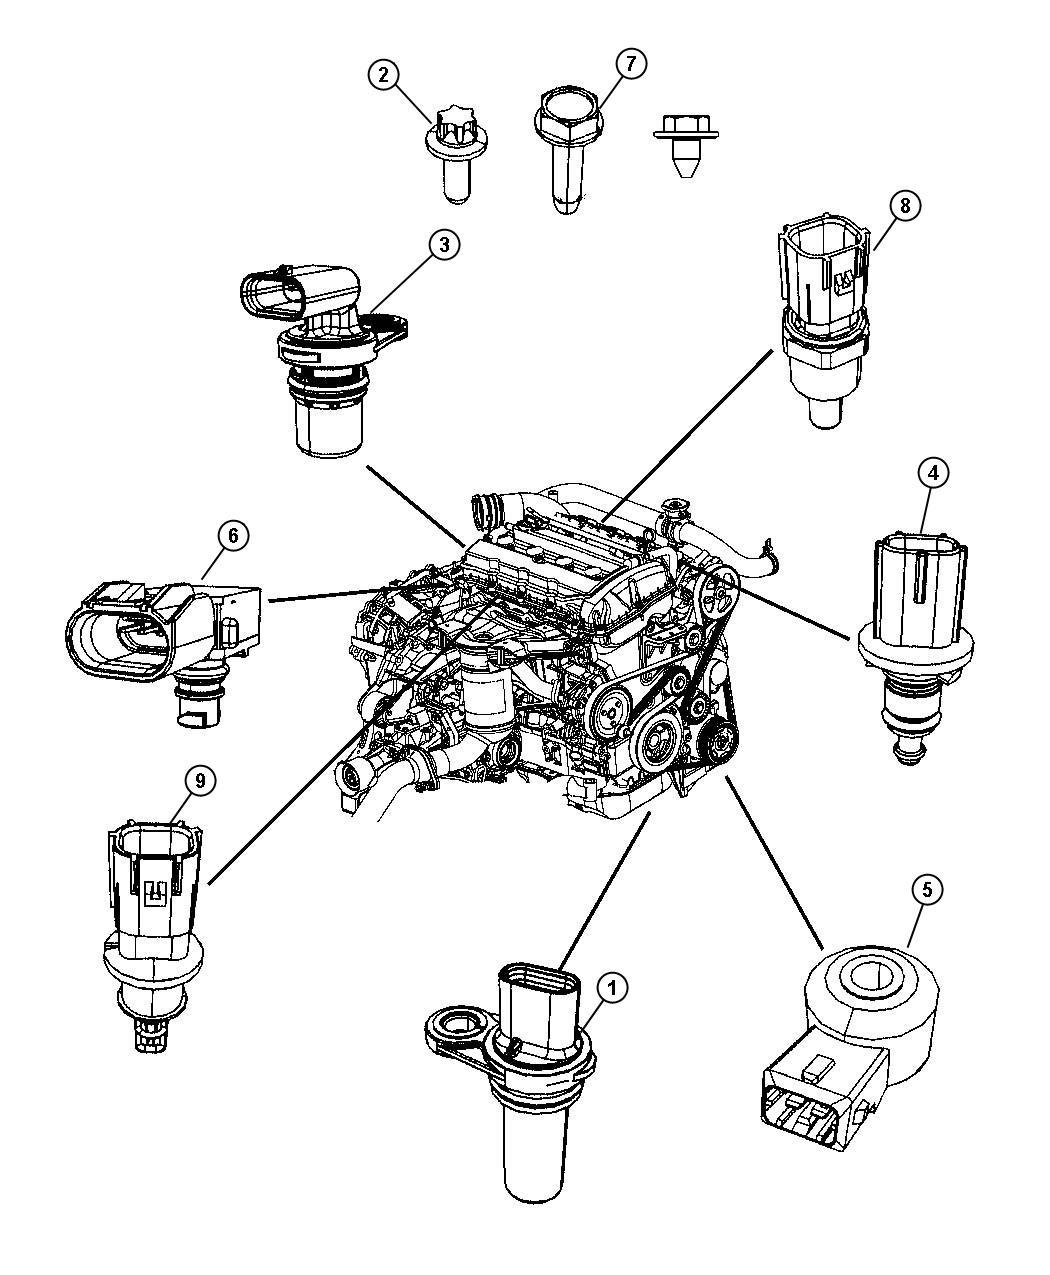 Dodge Caliber Sensor Crankshaft Position Vehicle Speed